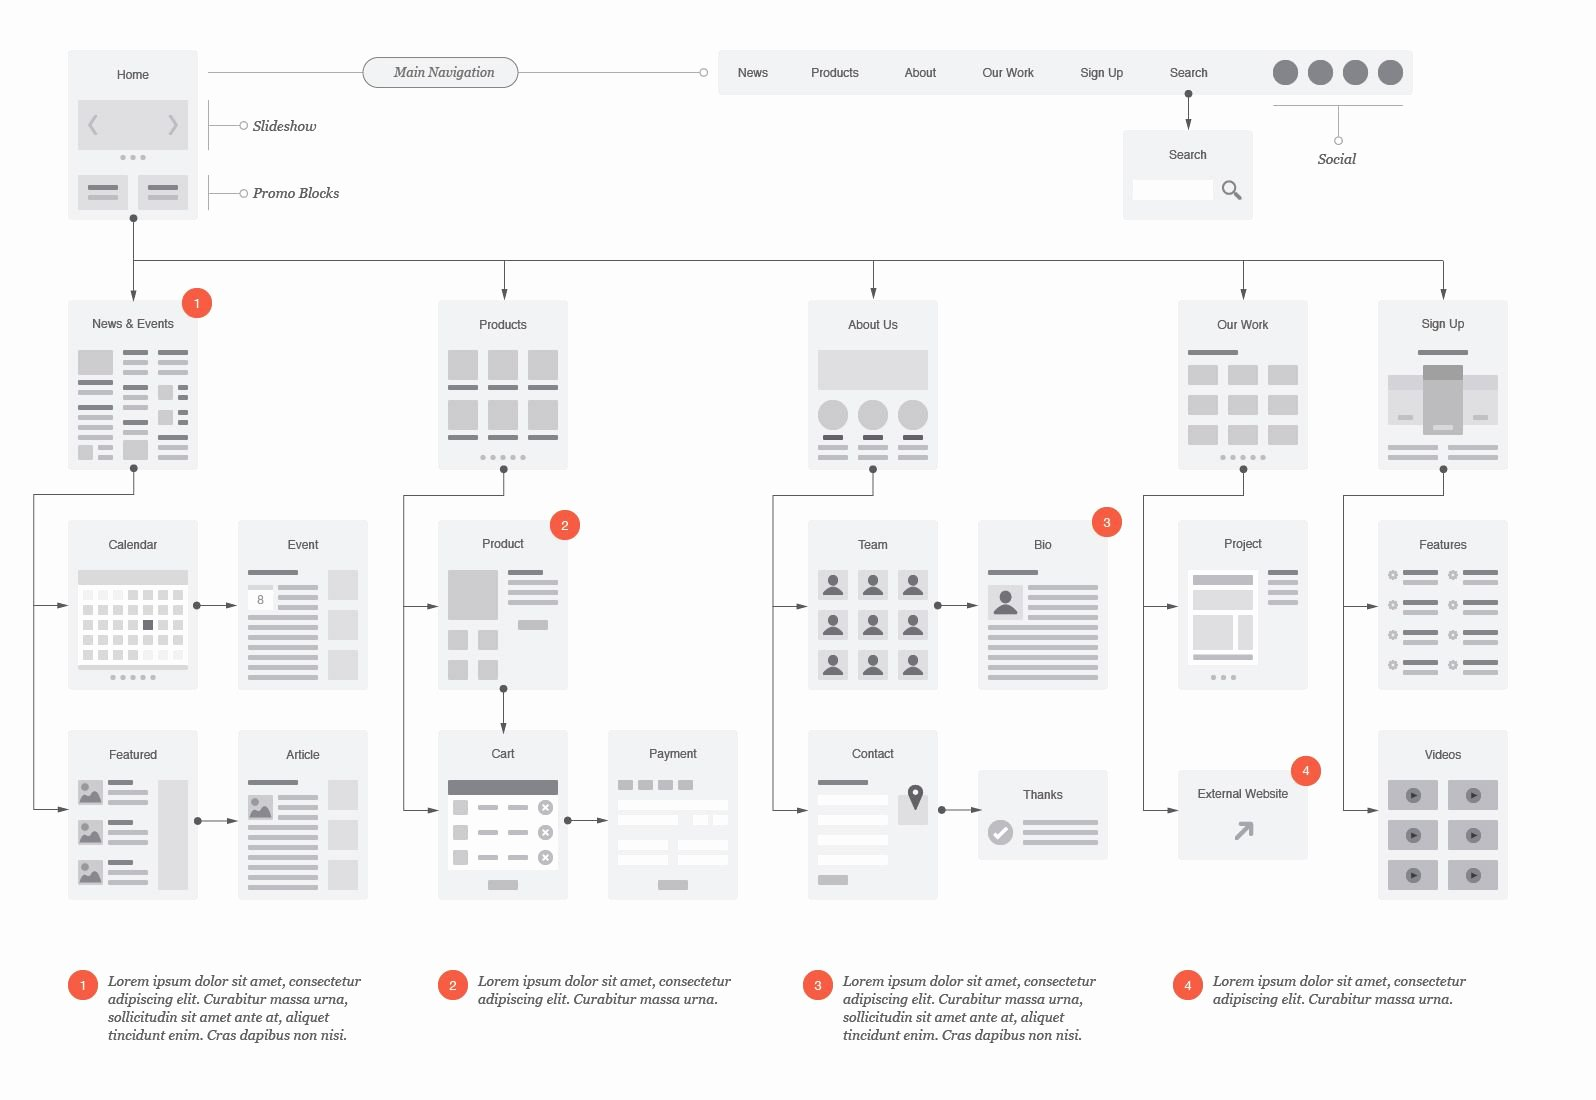 Website Map Template Best Of Website Flowchart & Sitemap for Illustrator